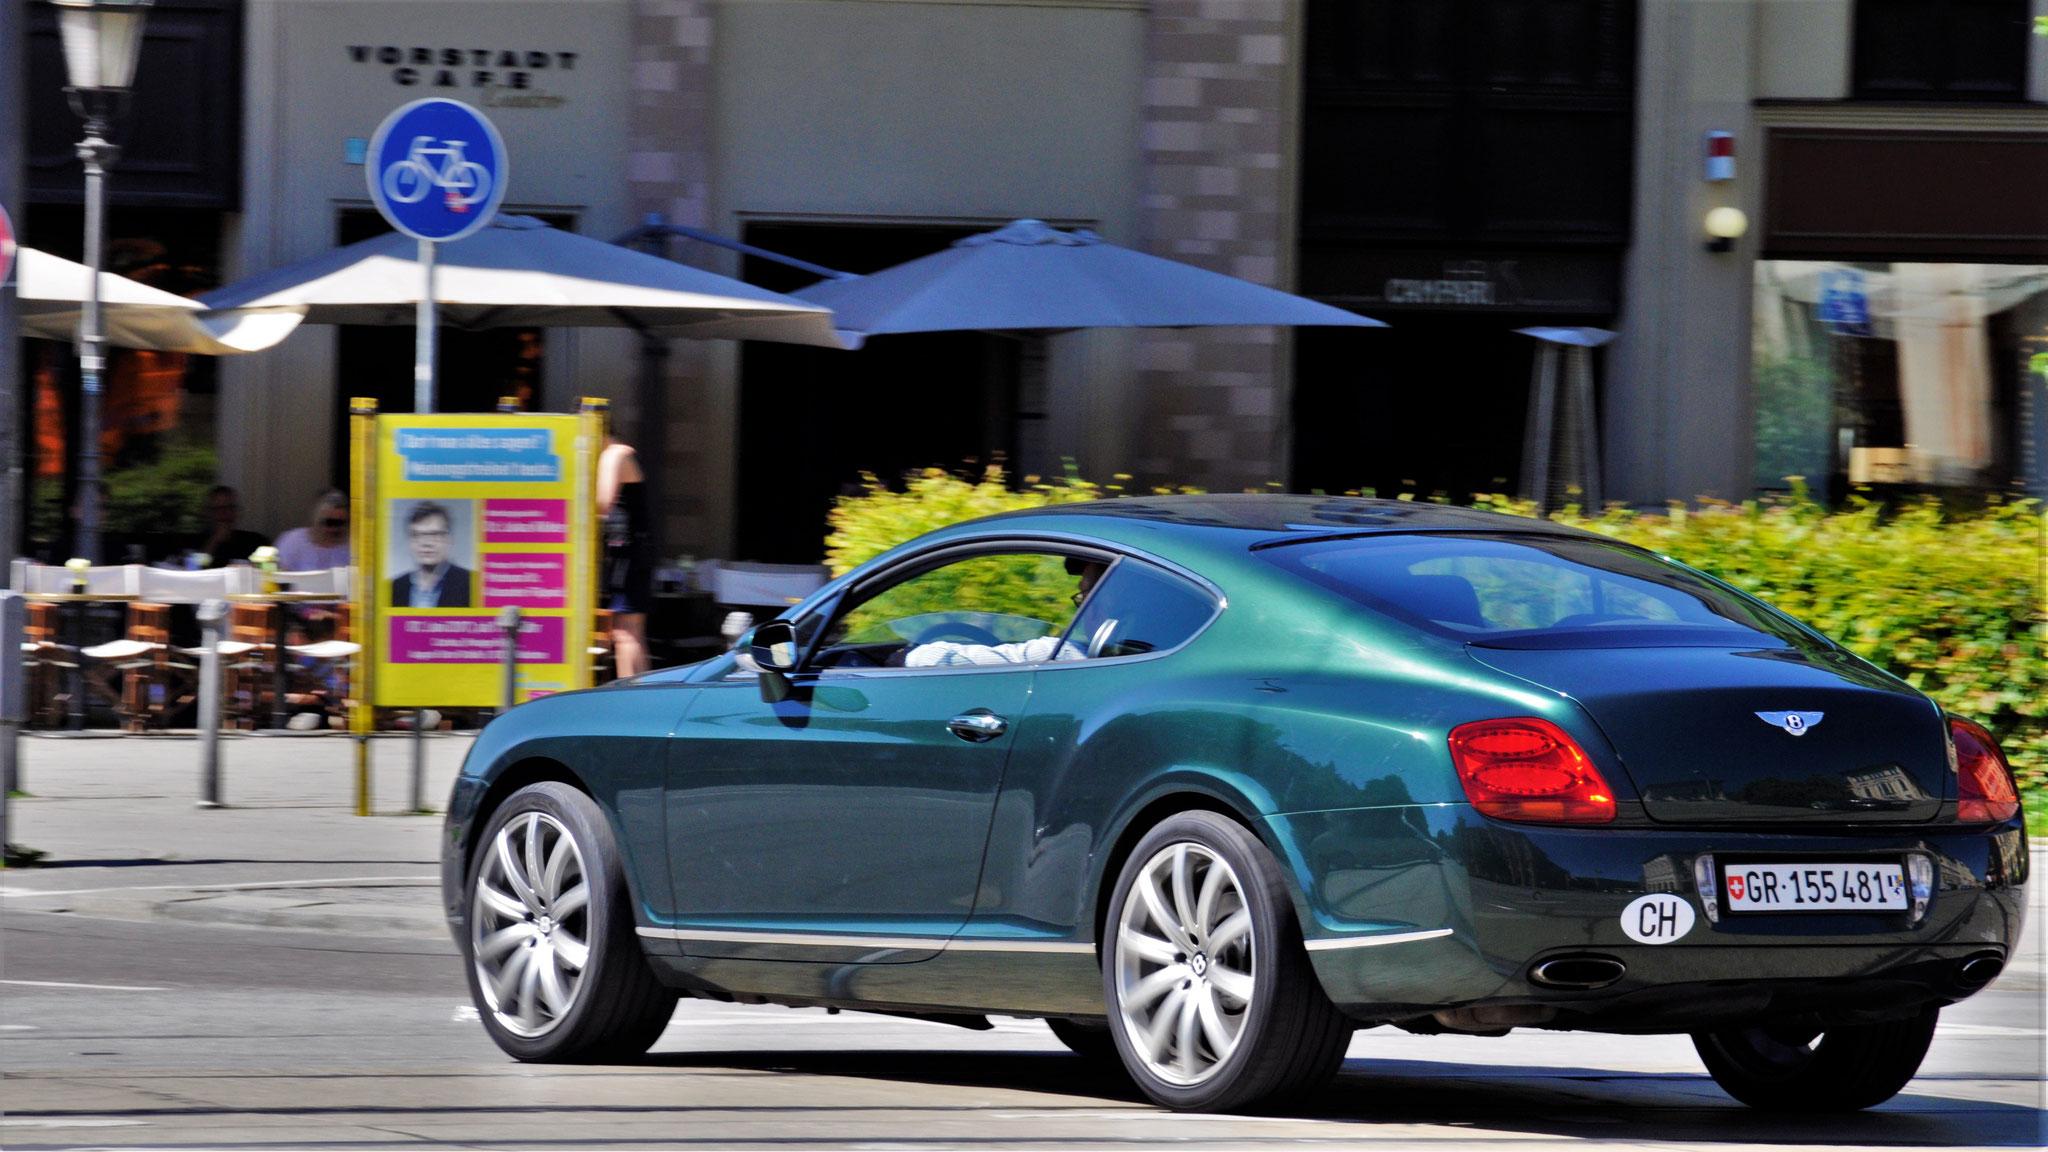 Bentley Continental GT - GR-155481 (CH)